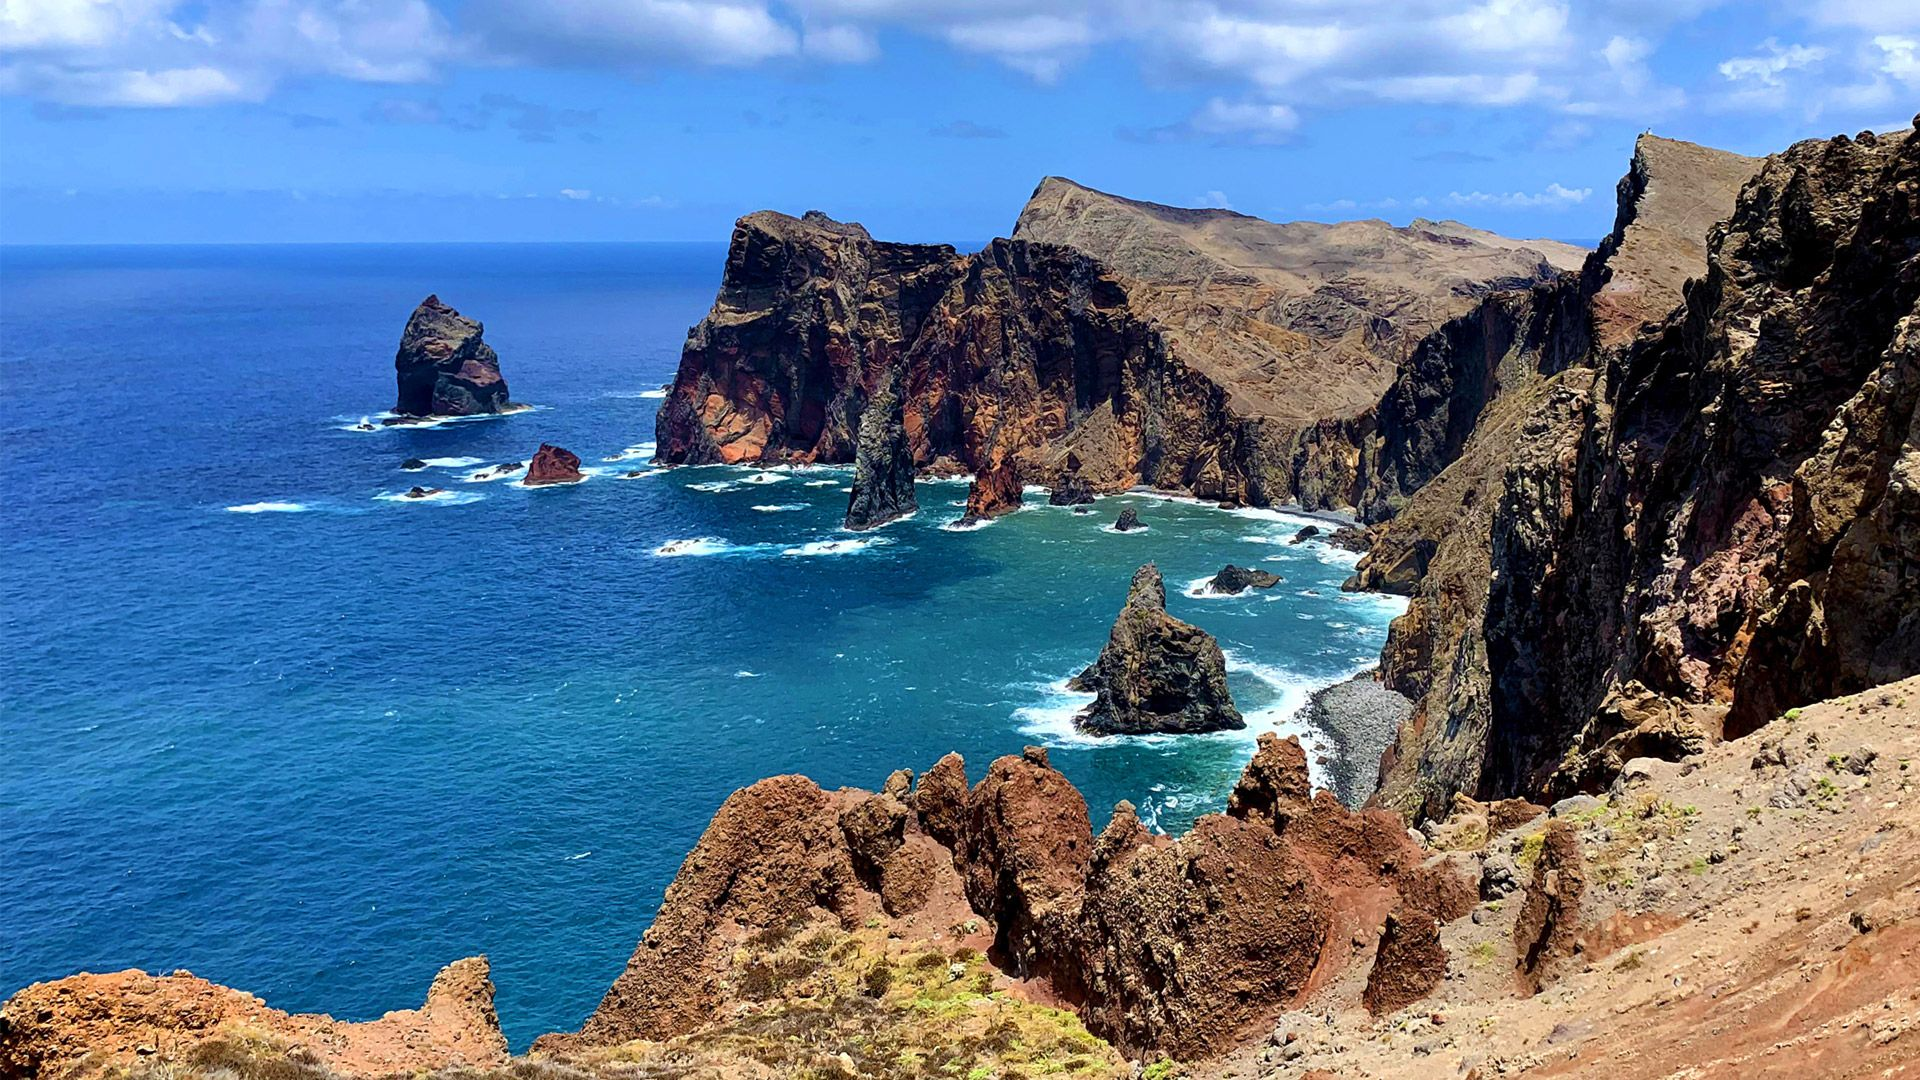 Sejur plaja Savoy Signature Madeira, 8 zile - 7 august 2021